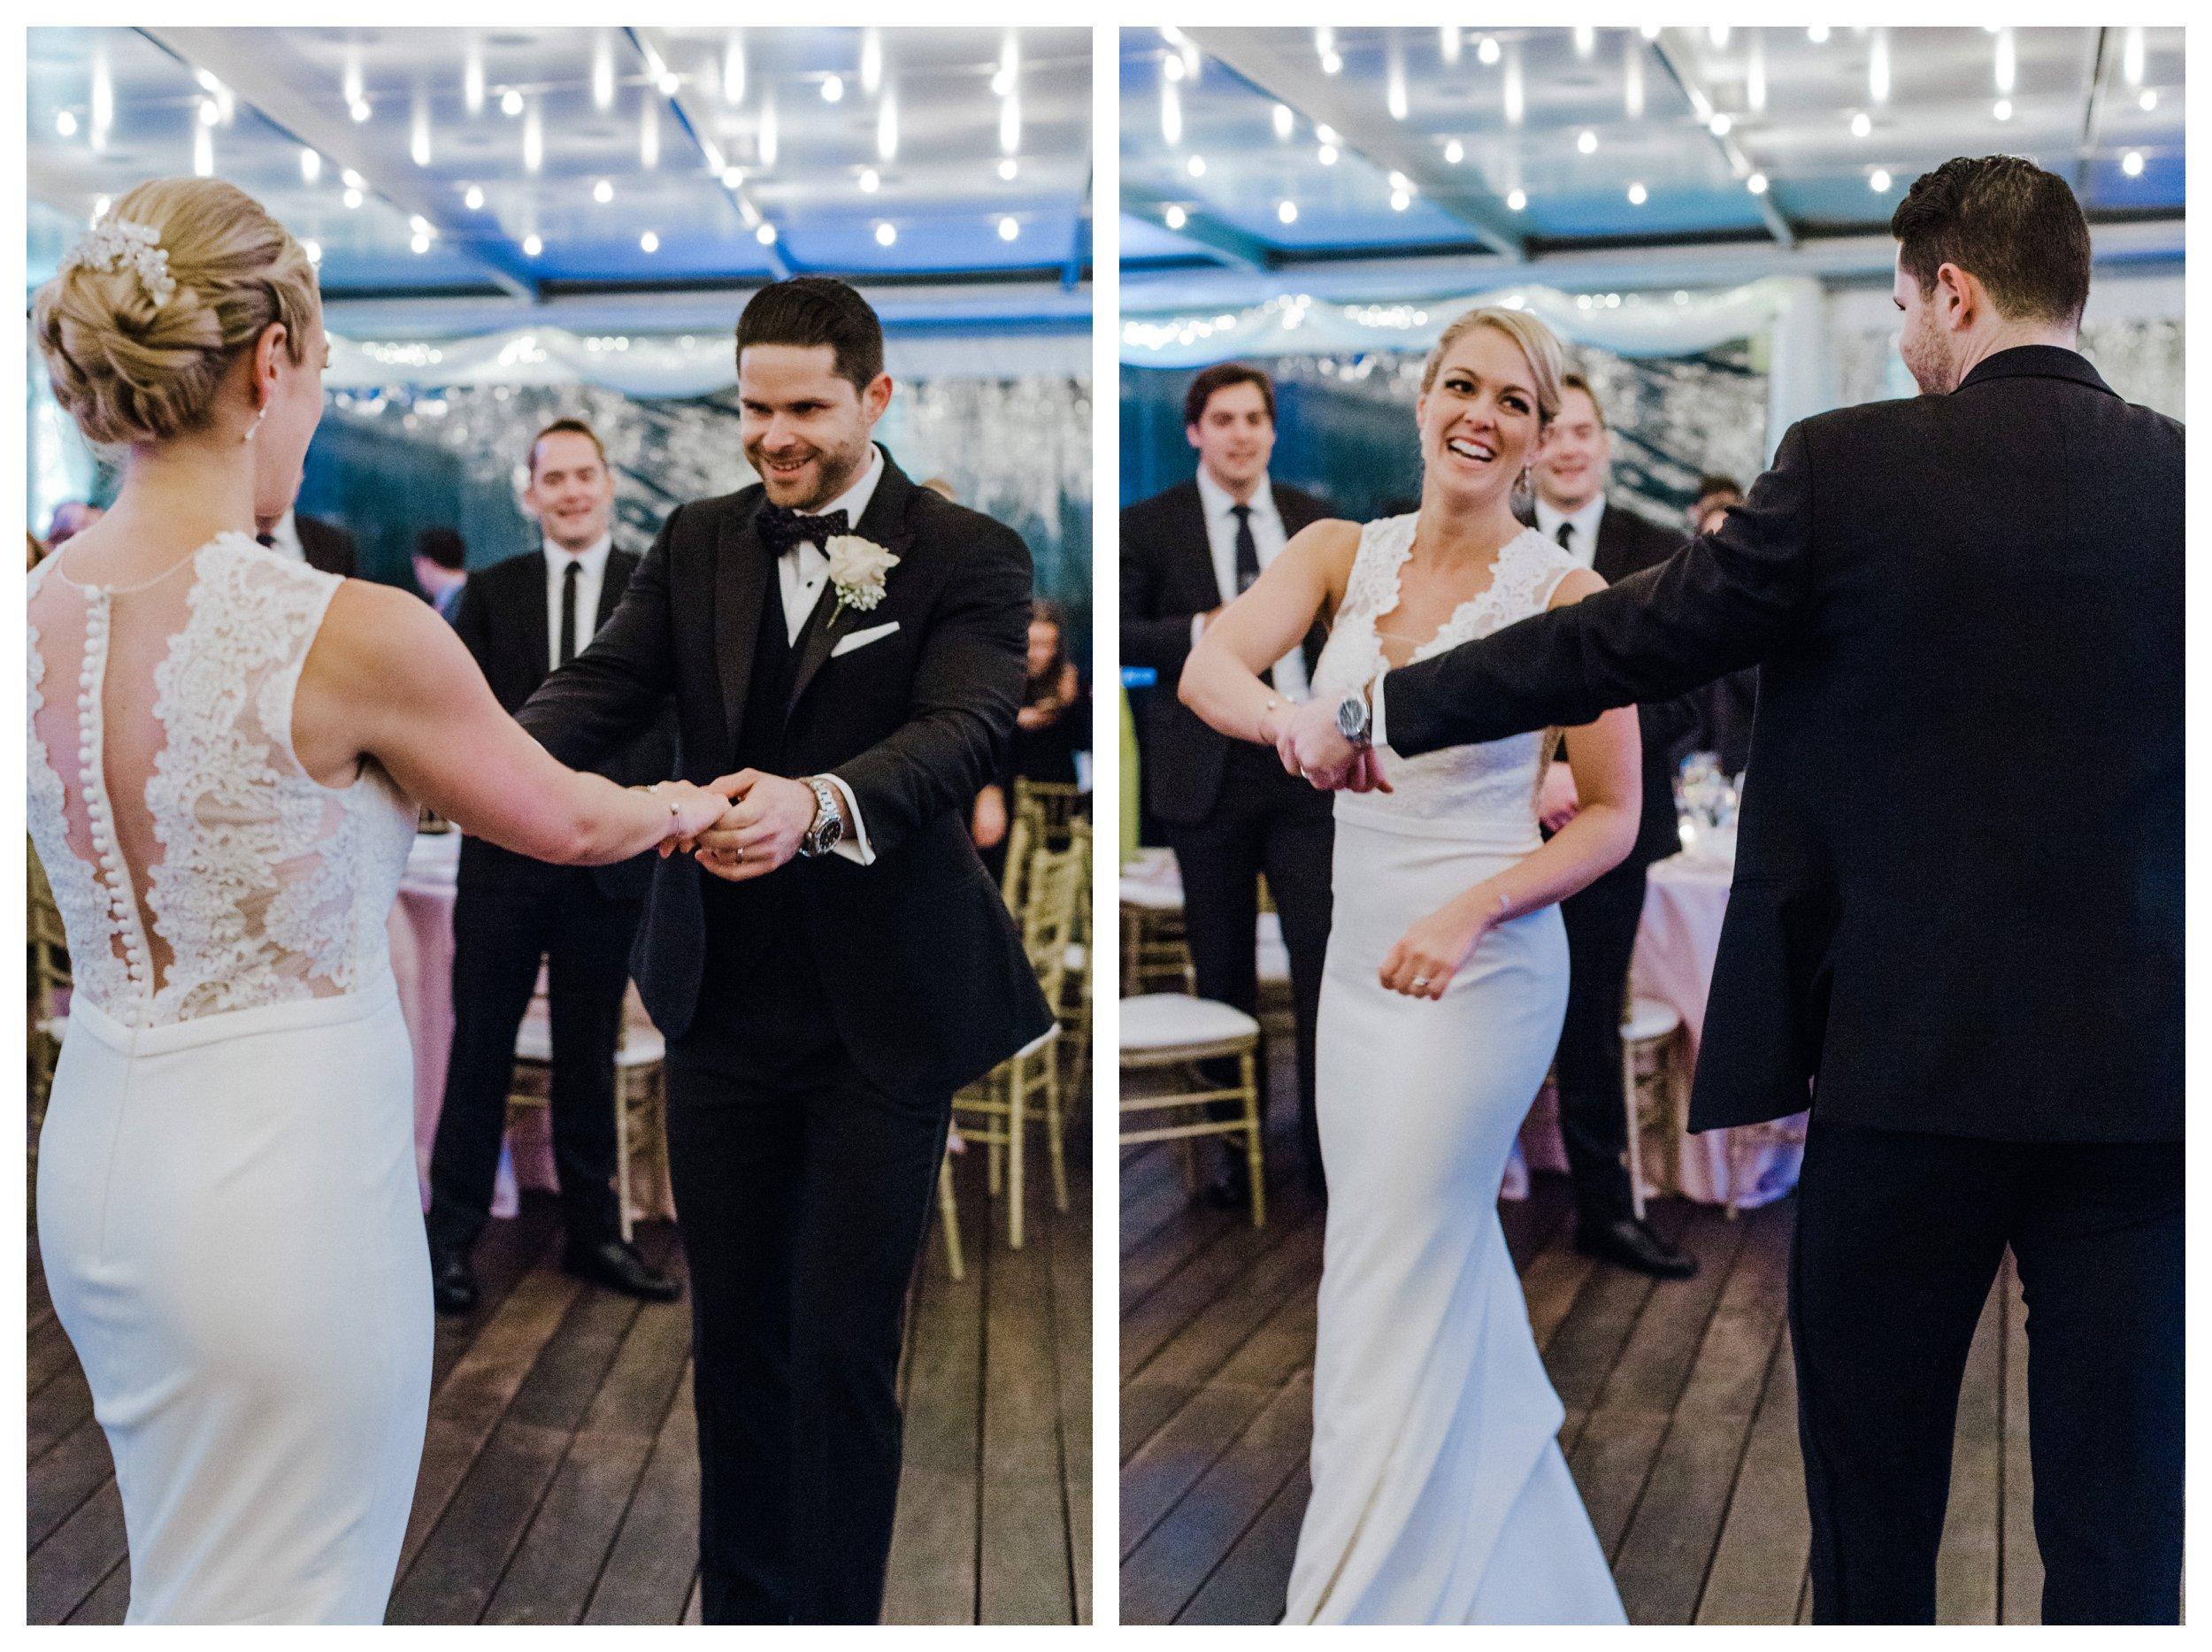 washington-dc-wedding-photographer-47.JPG